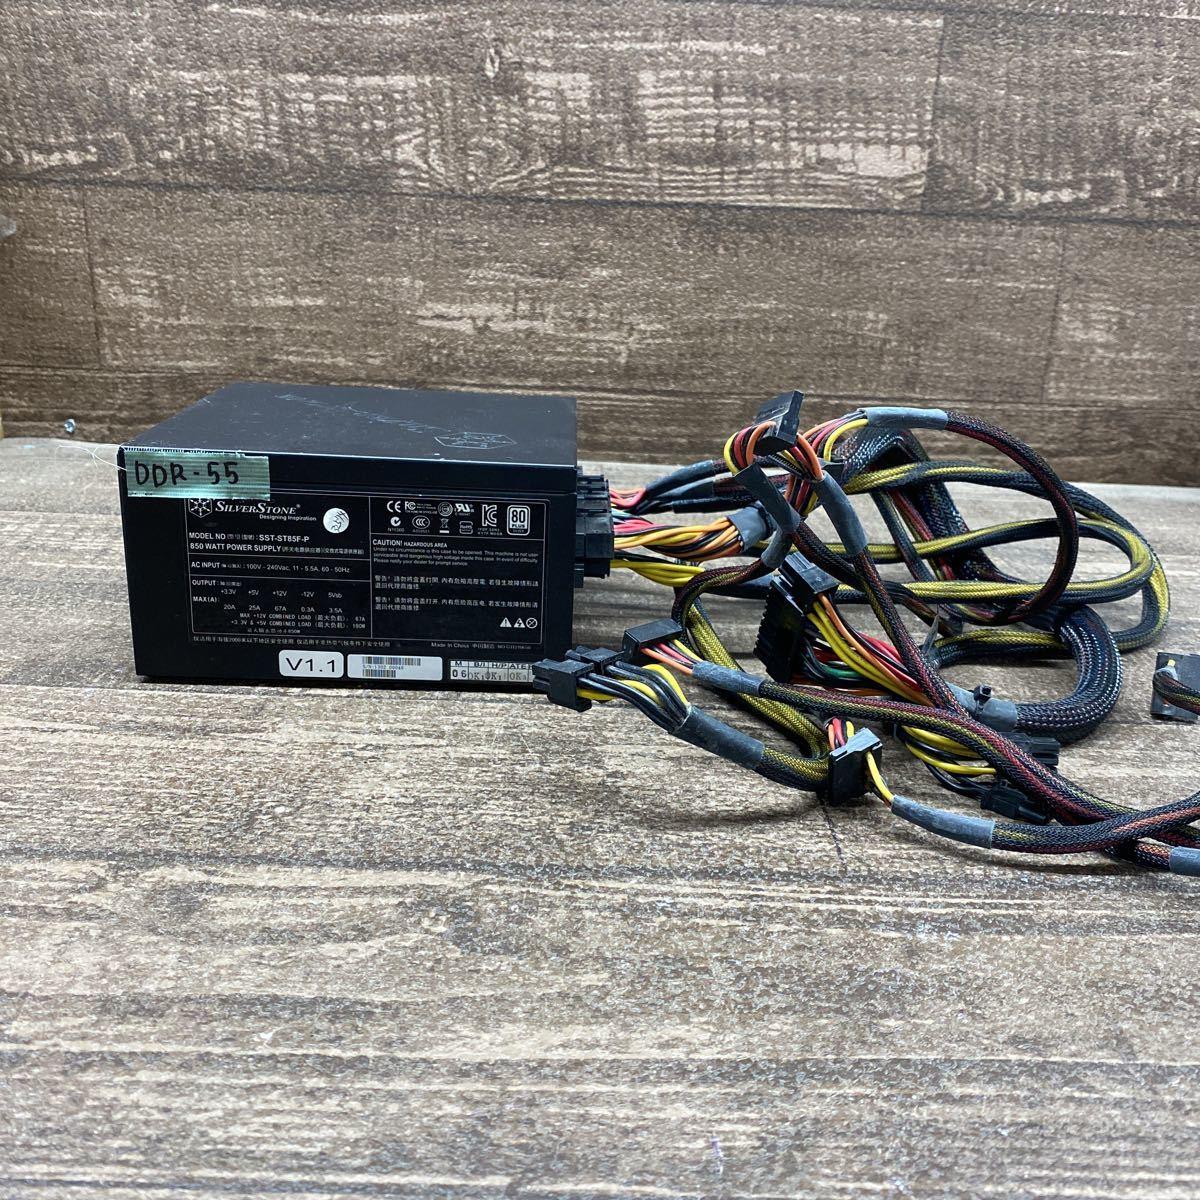 DDR-55 激安 PCパーツ大売り出し SILVER STONE SST-ST85F-P 850W 電源BOX 電源ユニット 中古品